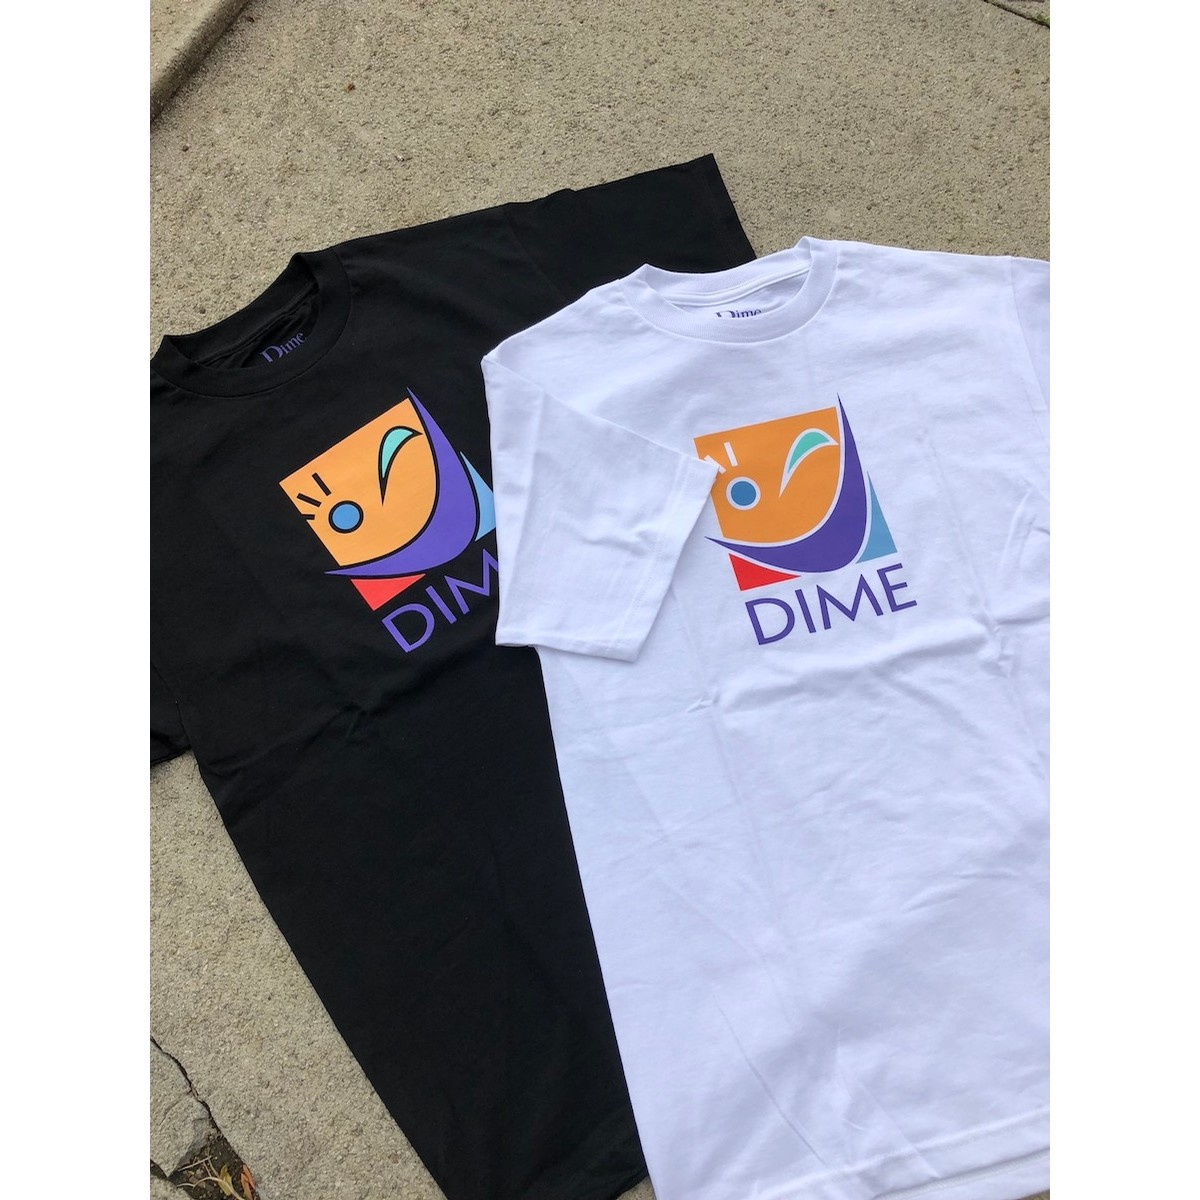 Dime Wink Shirt